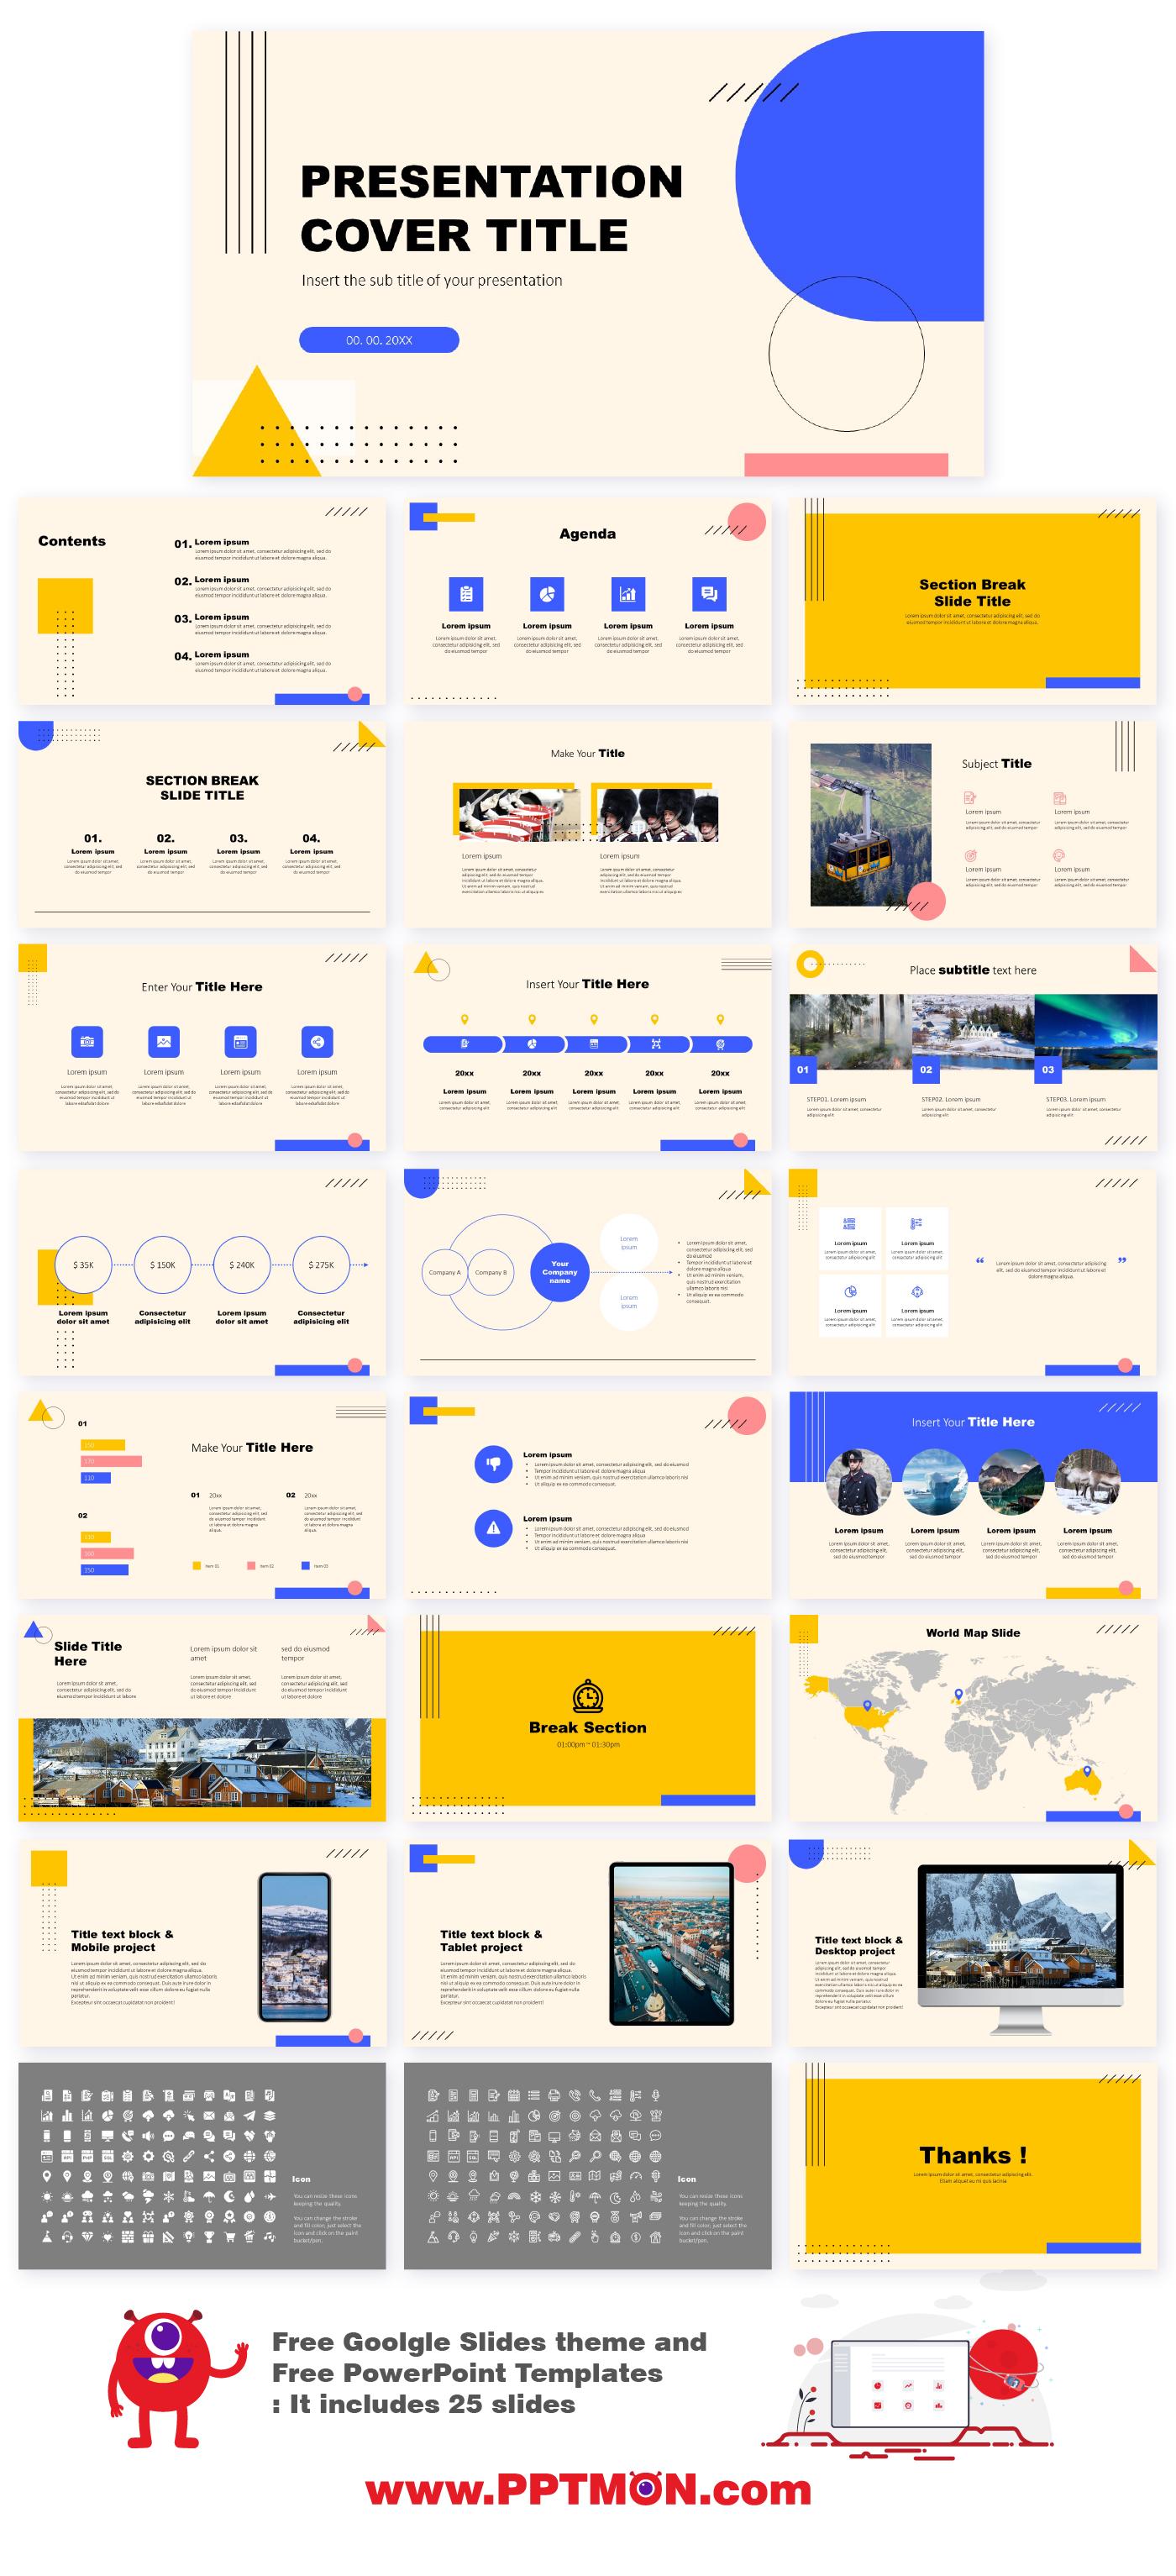 Minimal Memphis Design Presentation Free Google Slides Theme And Powerpoint Te Powerpoint Templates Creative Powerpoint Templates Powerpoint Design Templates